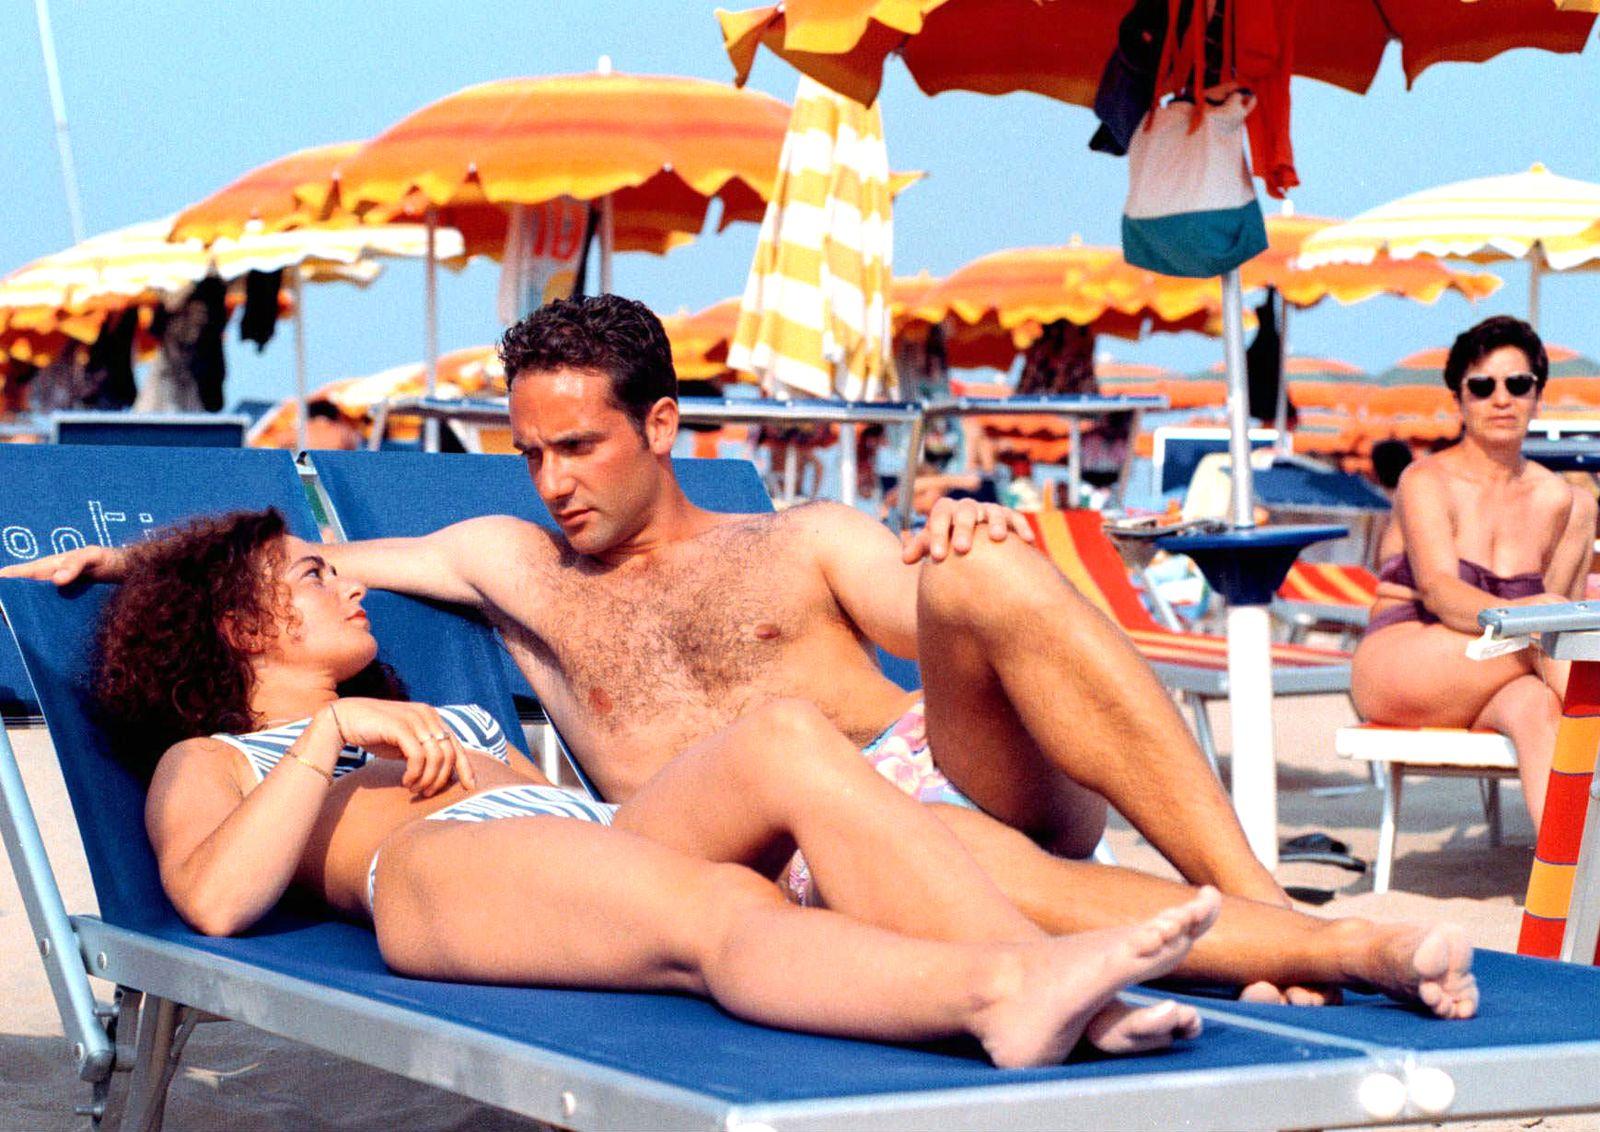 Italien / Urlaub / Strand